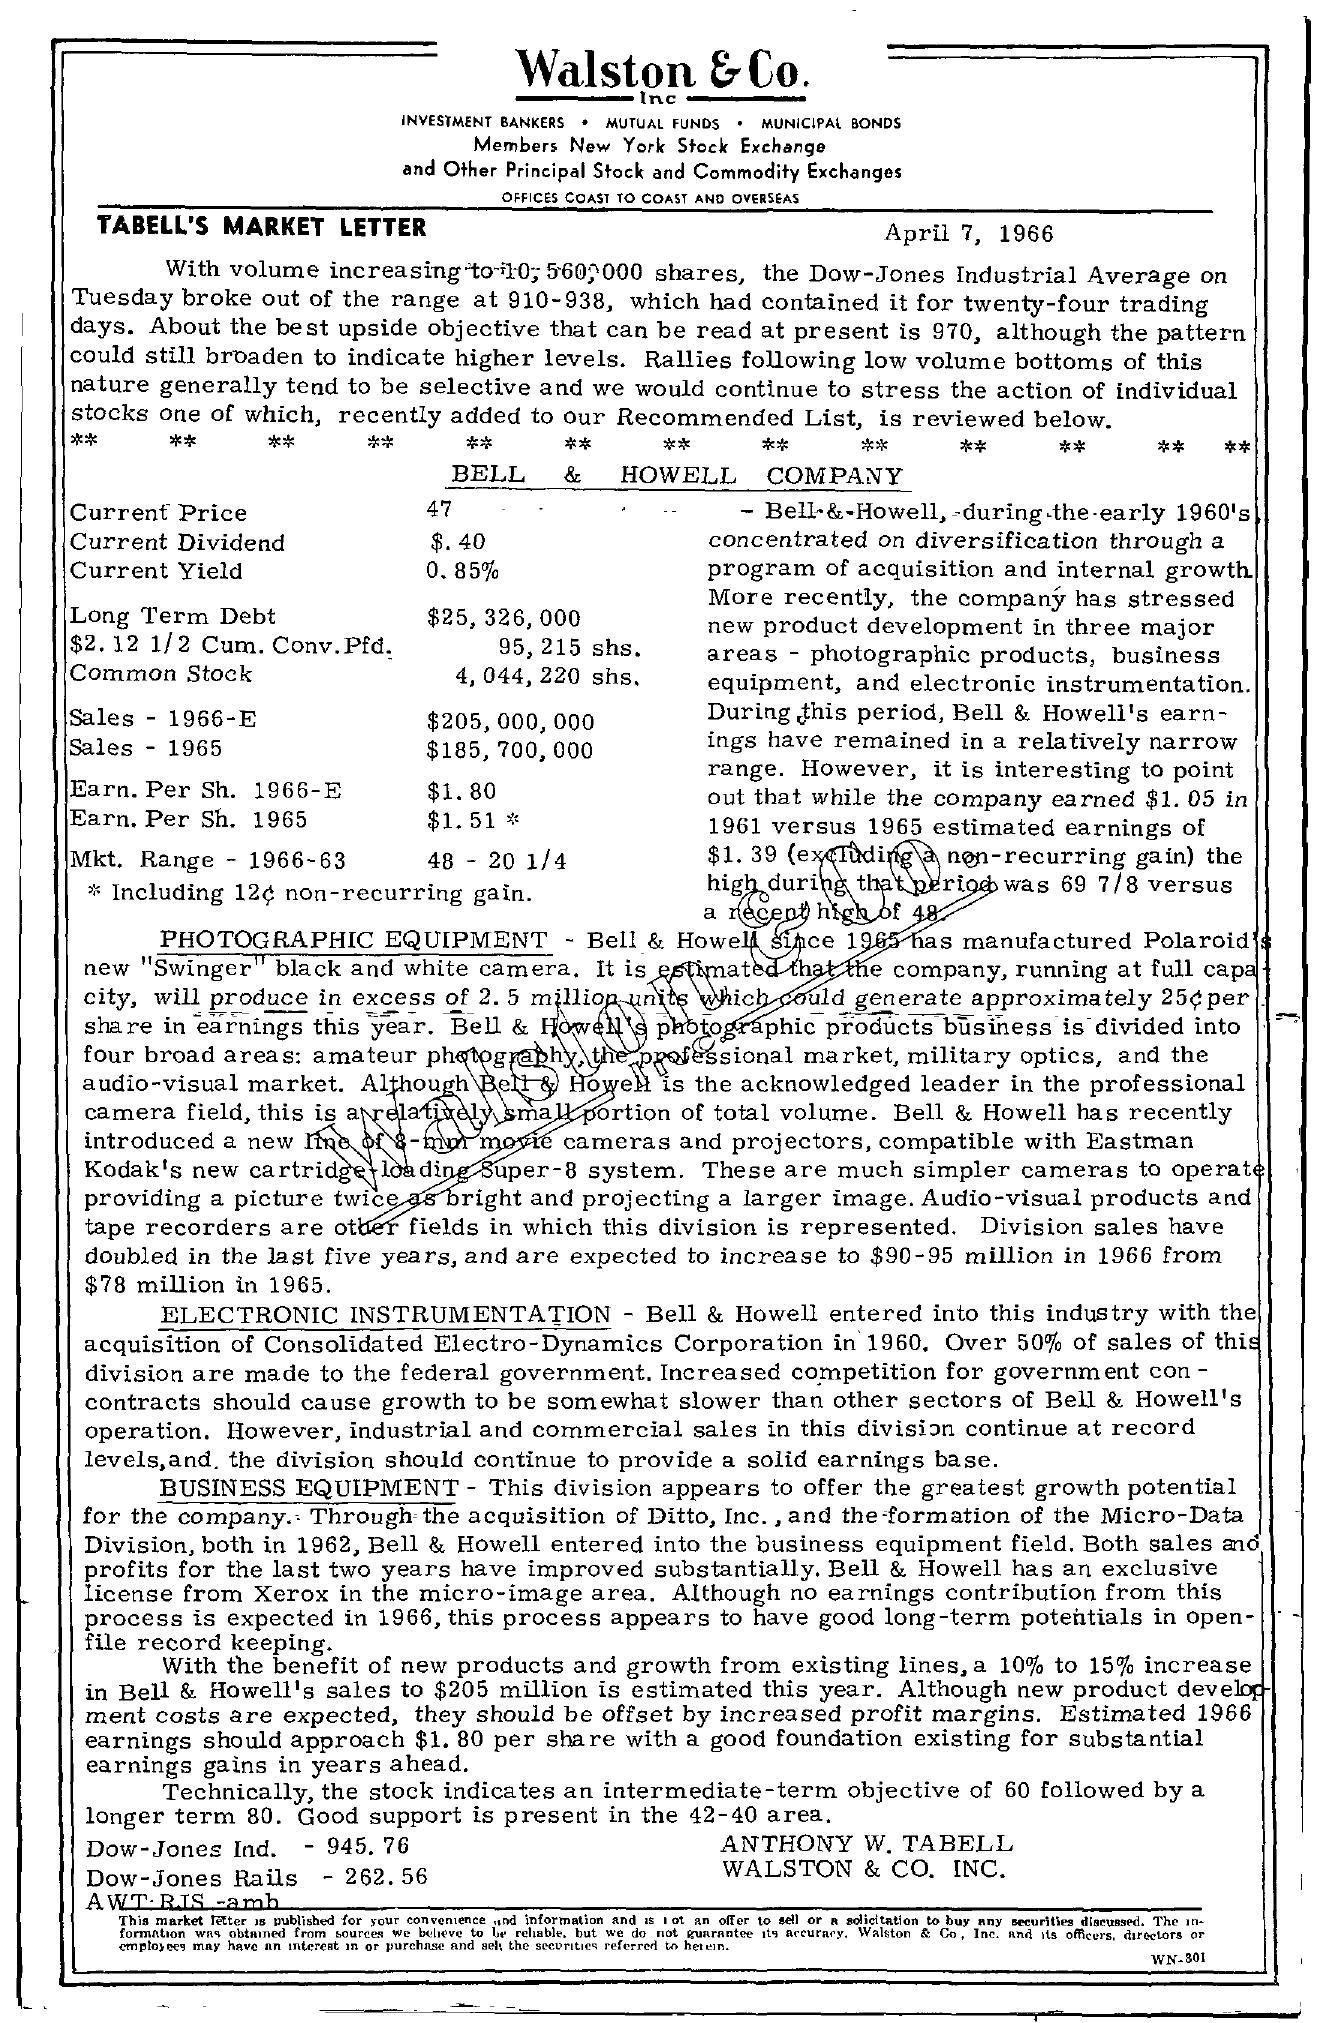 Tabell's Market Letter - April 07, 1966